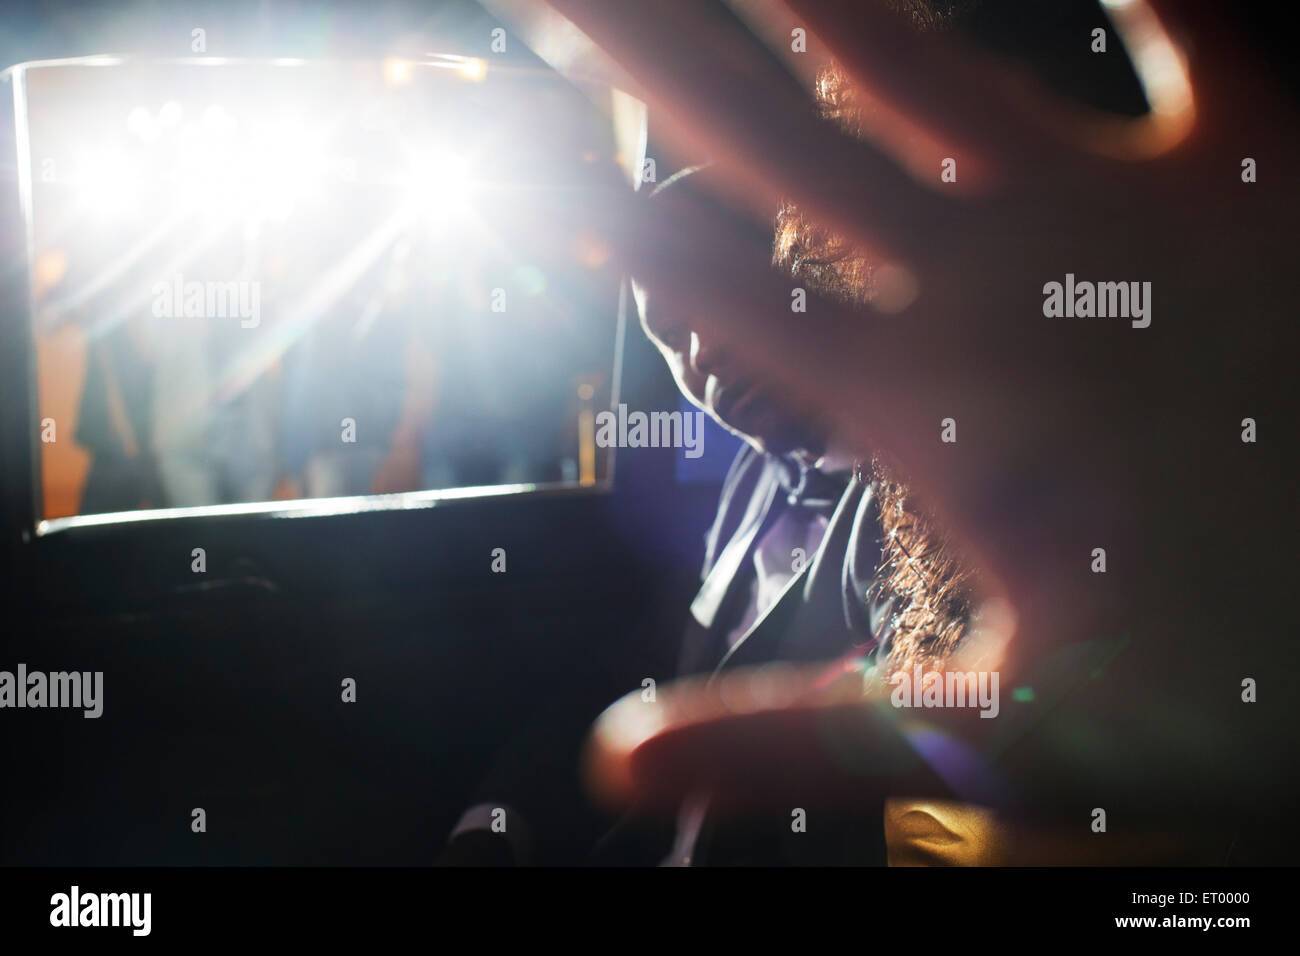 Pareja de famosos bloqueando cámara en limusina al evento Imagen De Stock